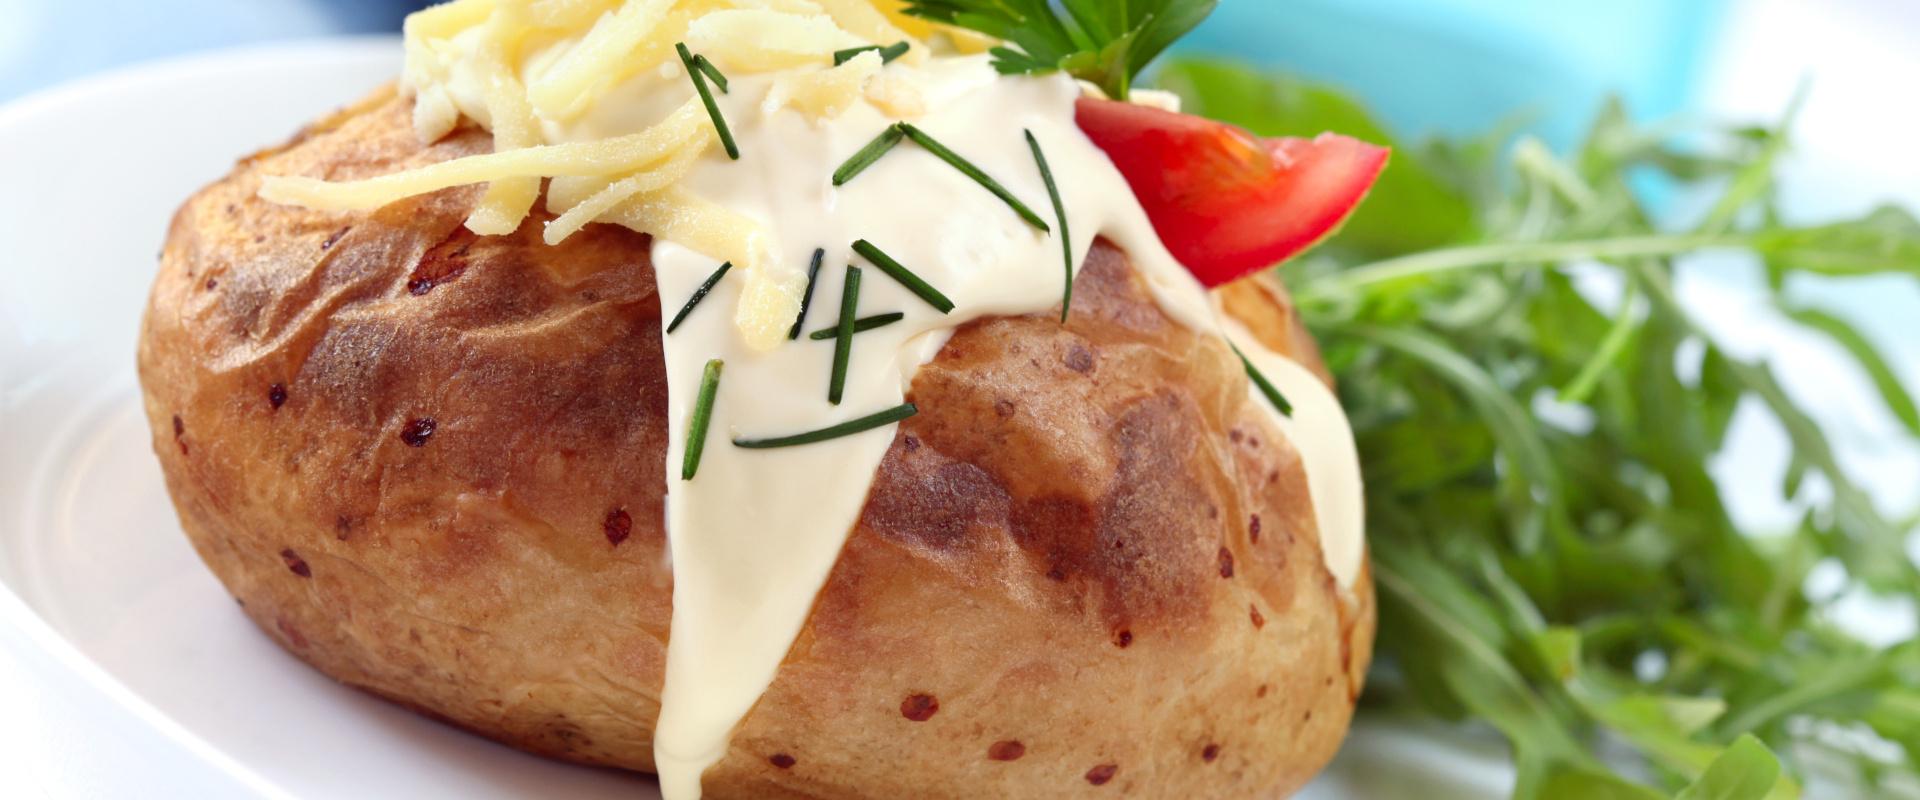 sütőben sült krumpli krémsajttal cover